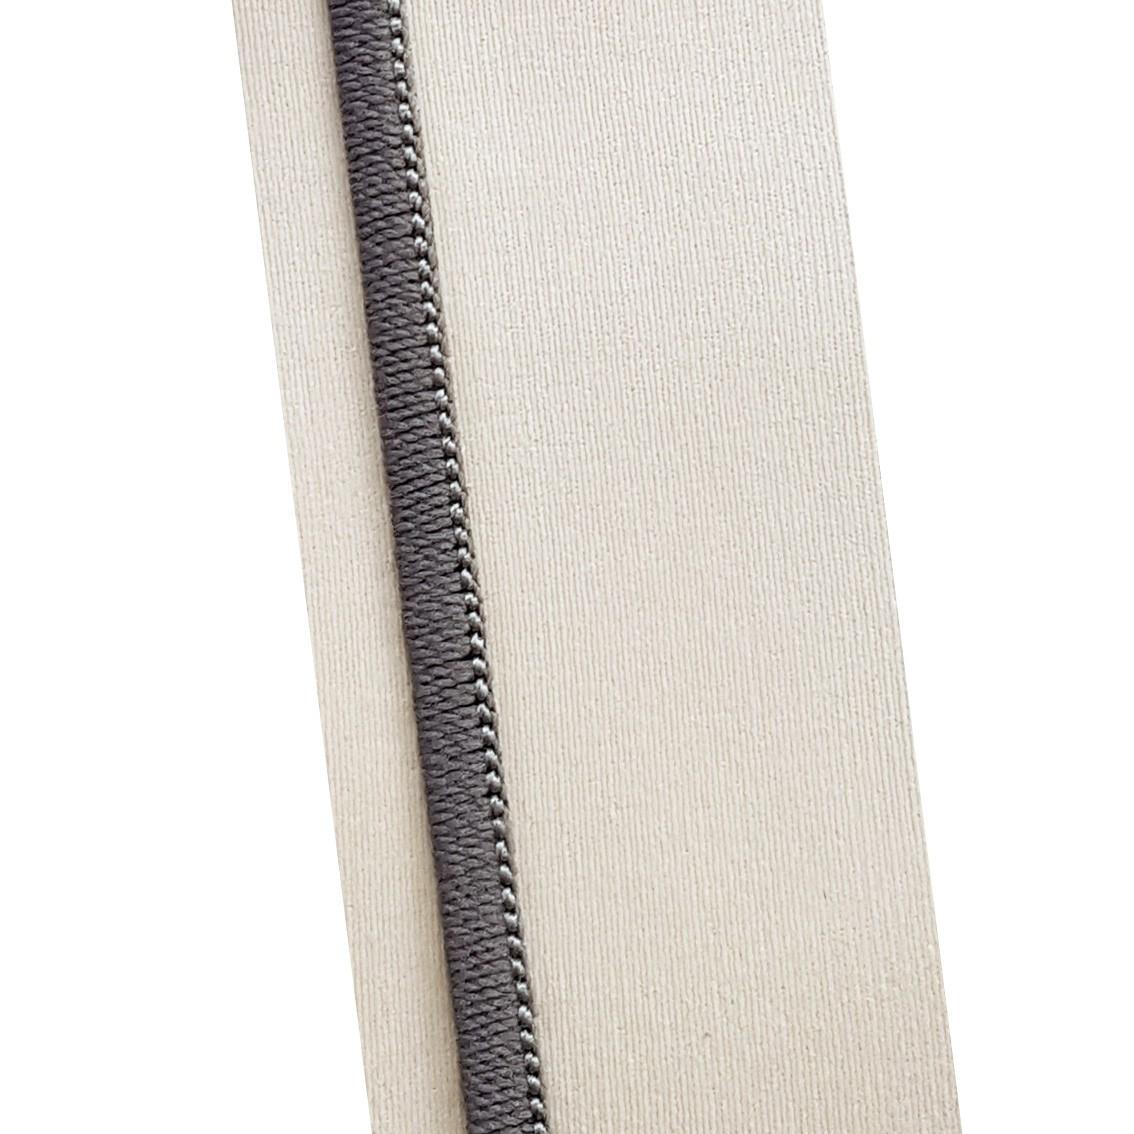 Passadeira Geométrico Black & Gray 66 x 240 cm